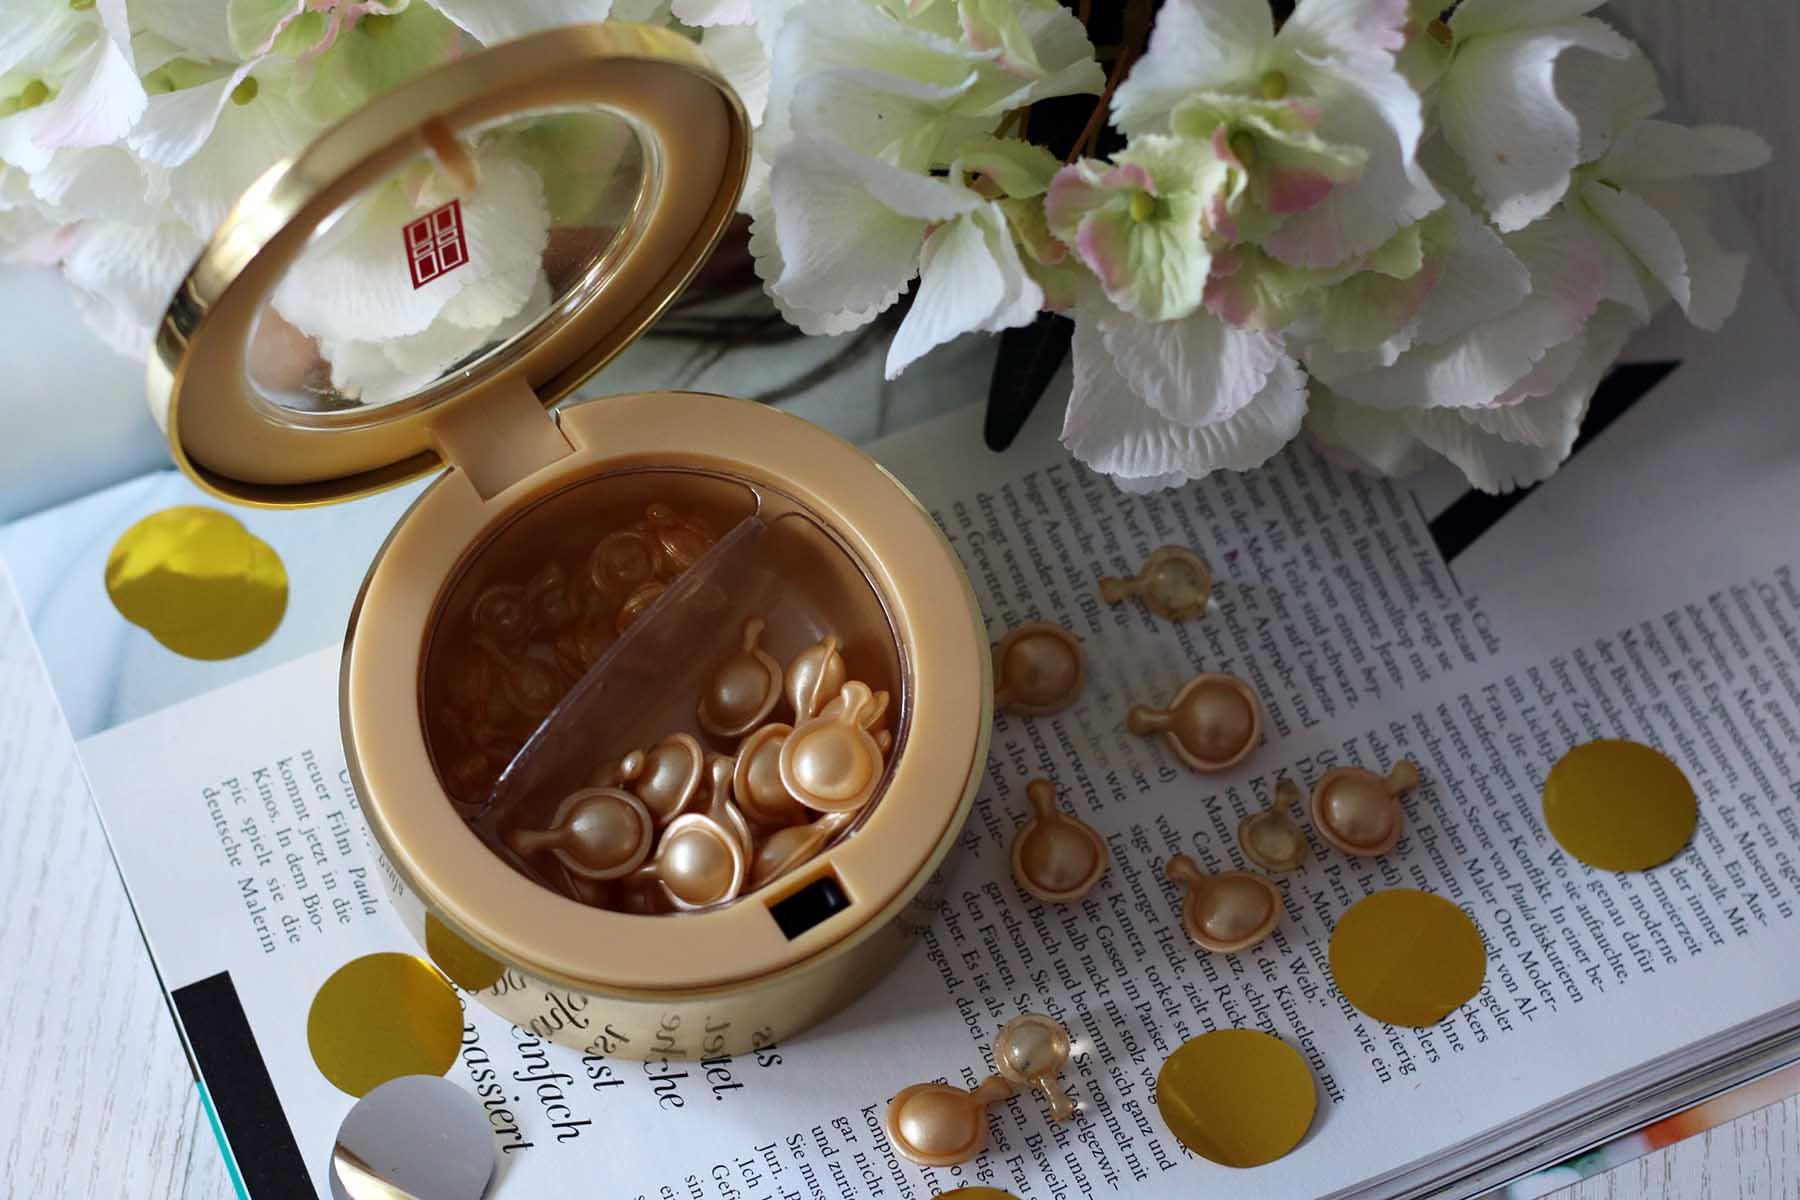 duty-free-shop-düsseldorf-worlddutyfree-yves-saint-laurent-parfüm-manifesto-beautyblog18